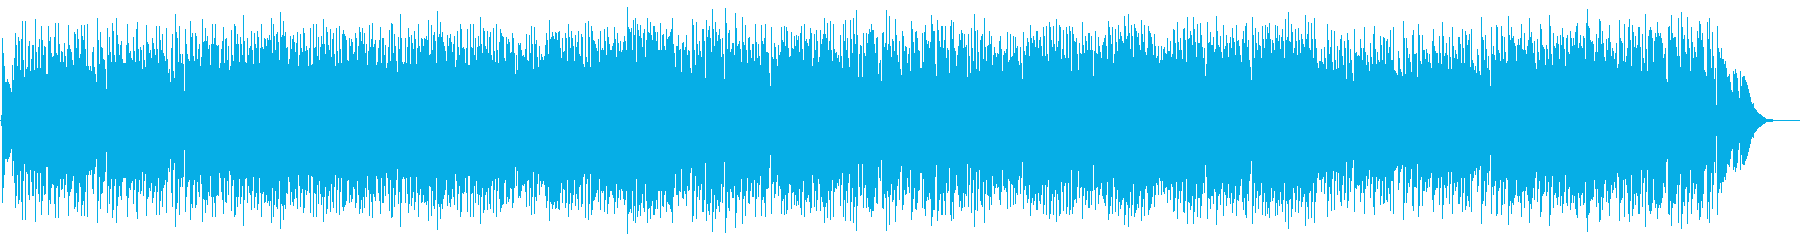 Doggy's Waltz (F. Chopin) Jazz's reproduced waveform